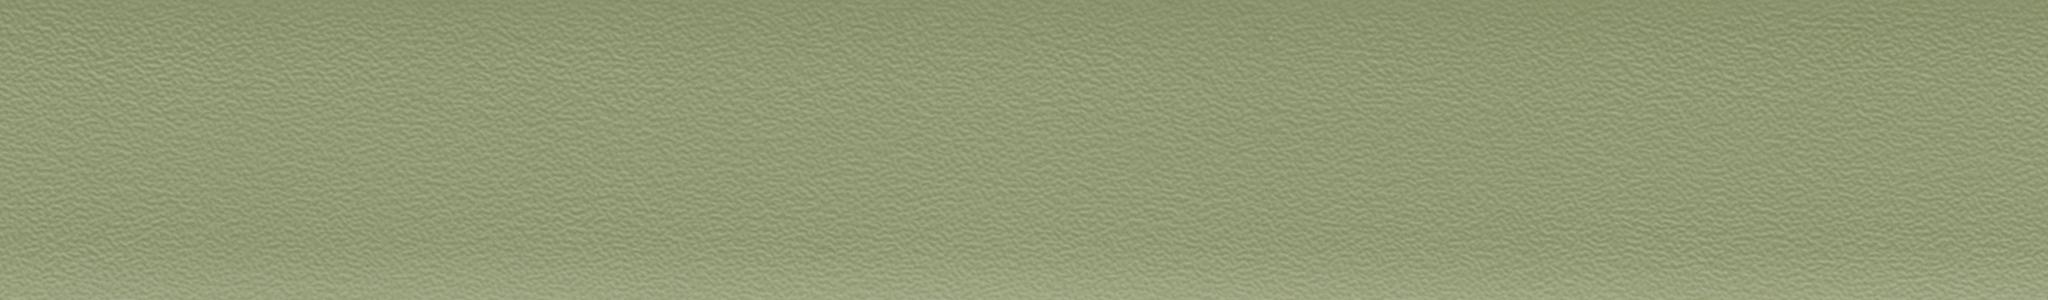 HU 167172 ABS hrana zelená perla 101